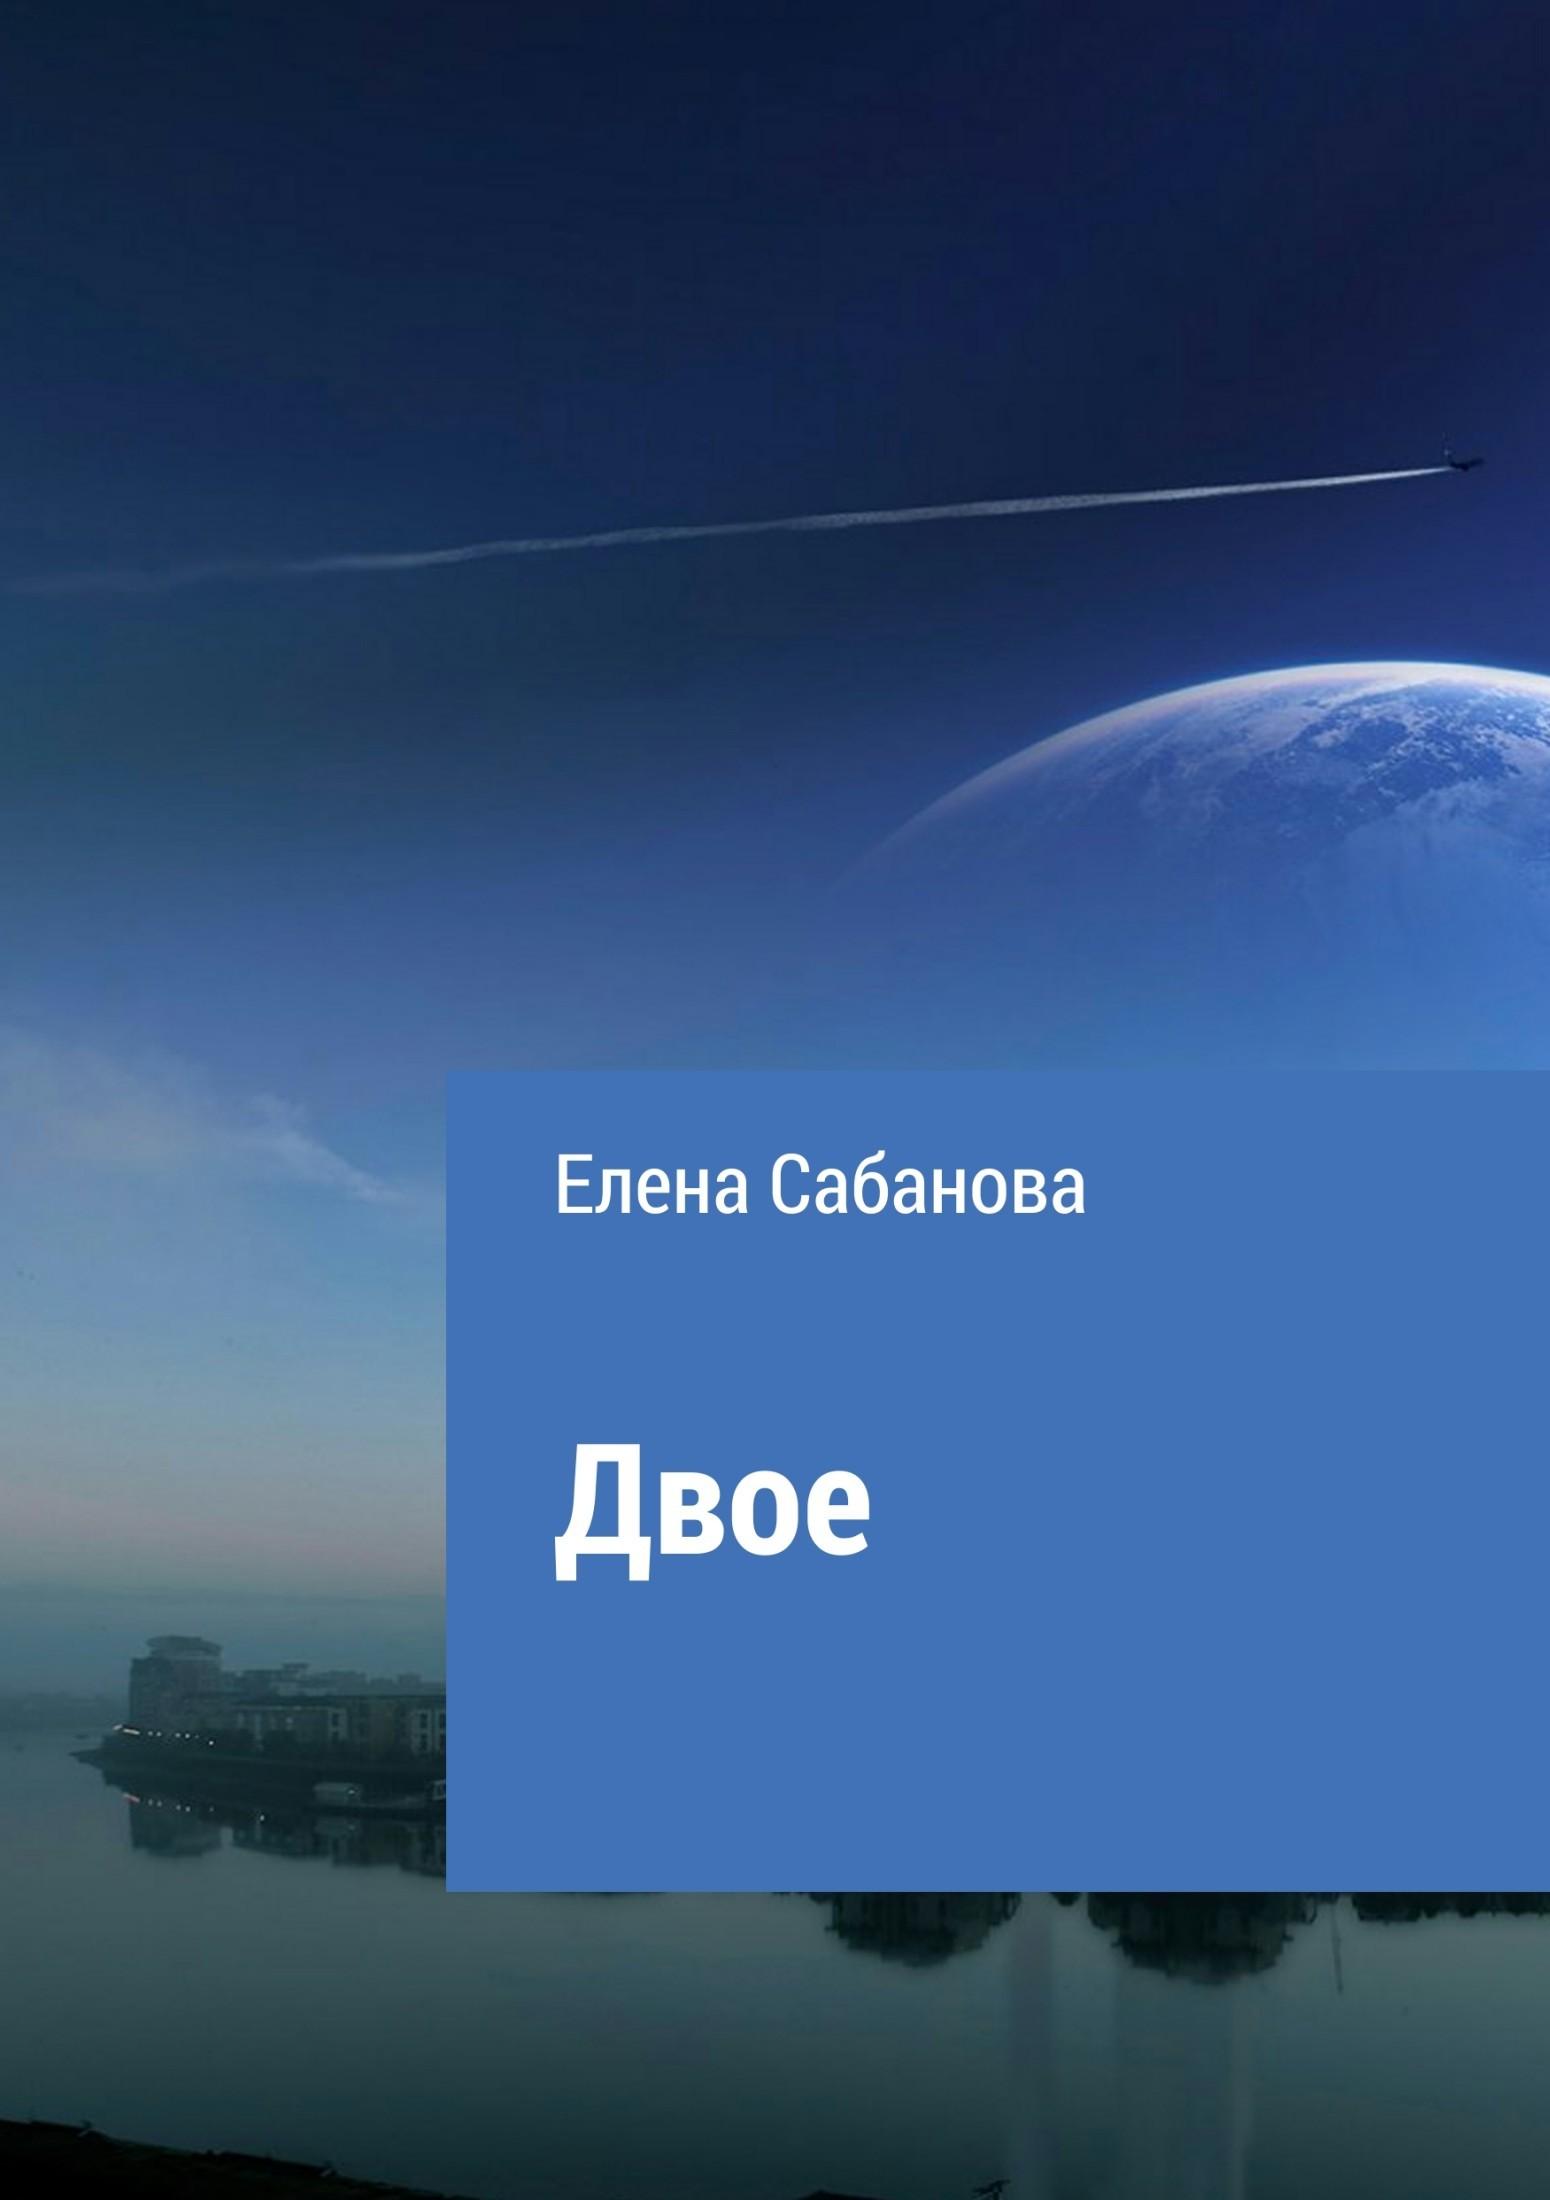 Елена Владимировна Сабанова. Двое